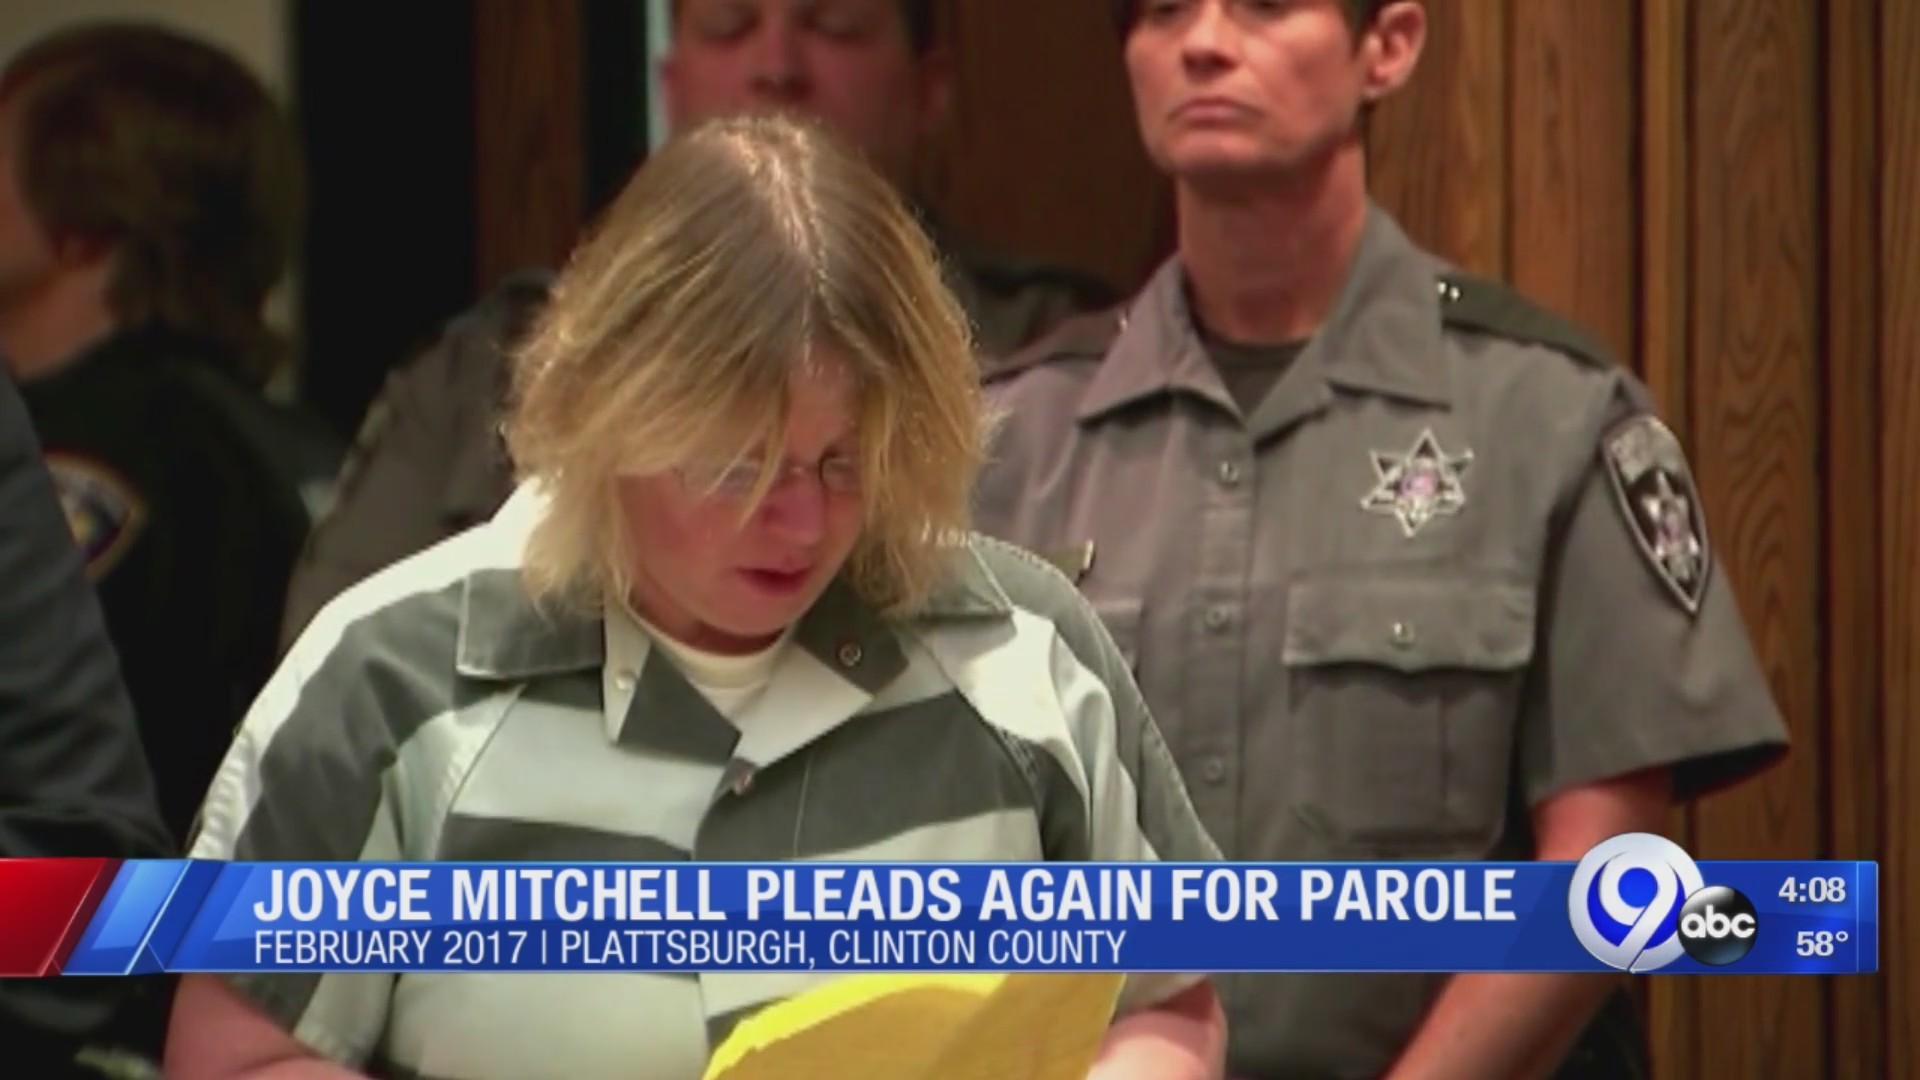 Joyce_Mitchell_up_for_parole_next_week_0_20190603201229